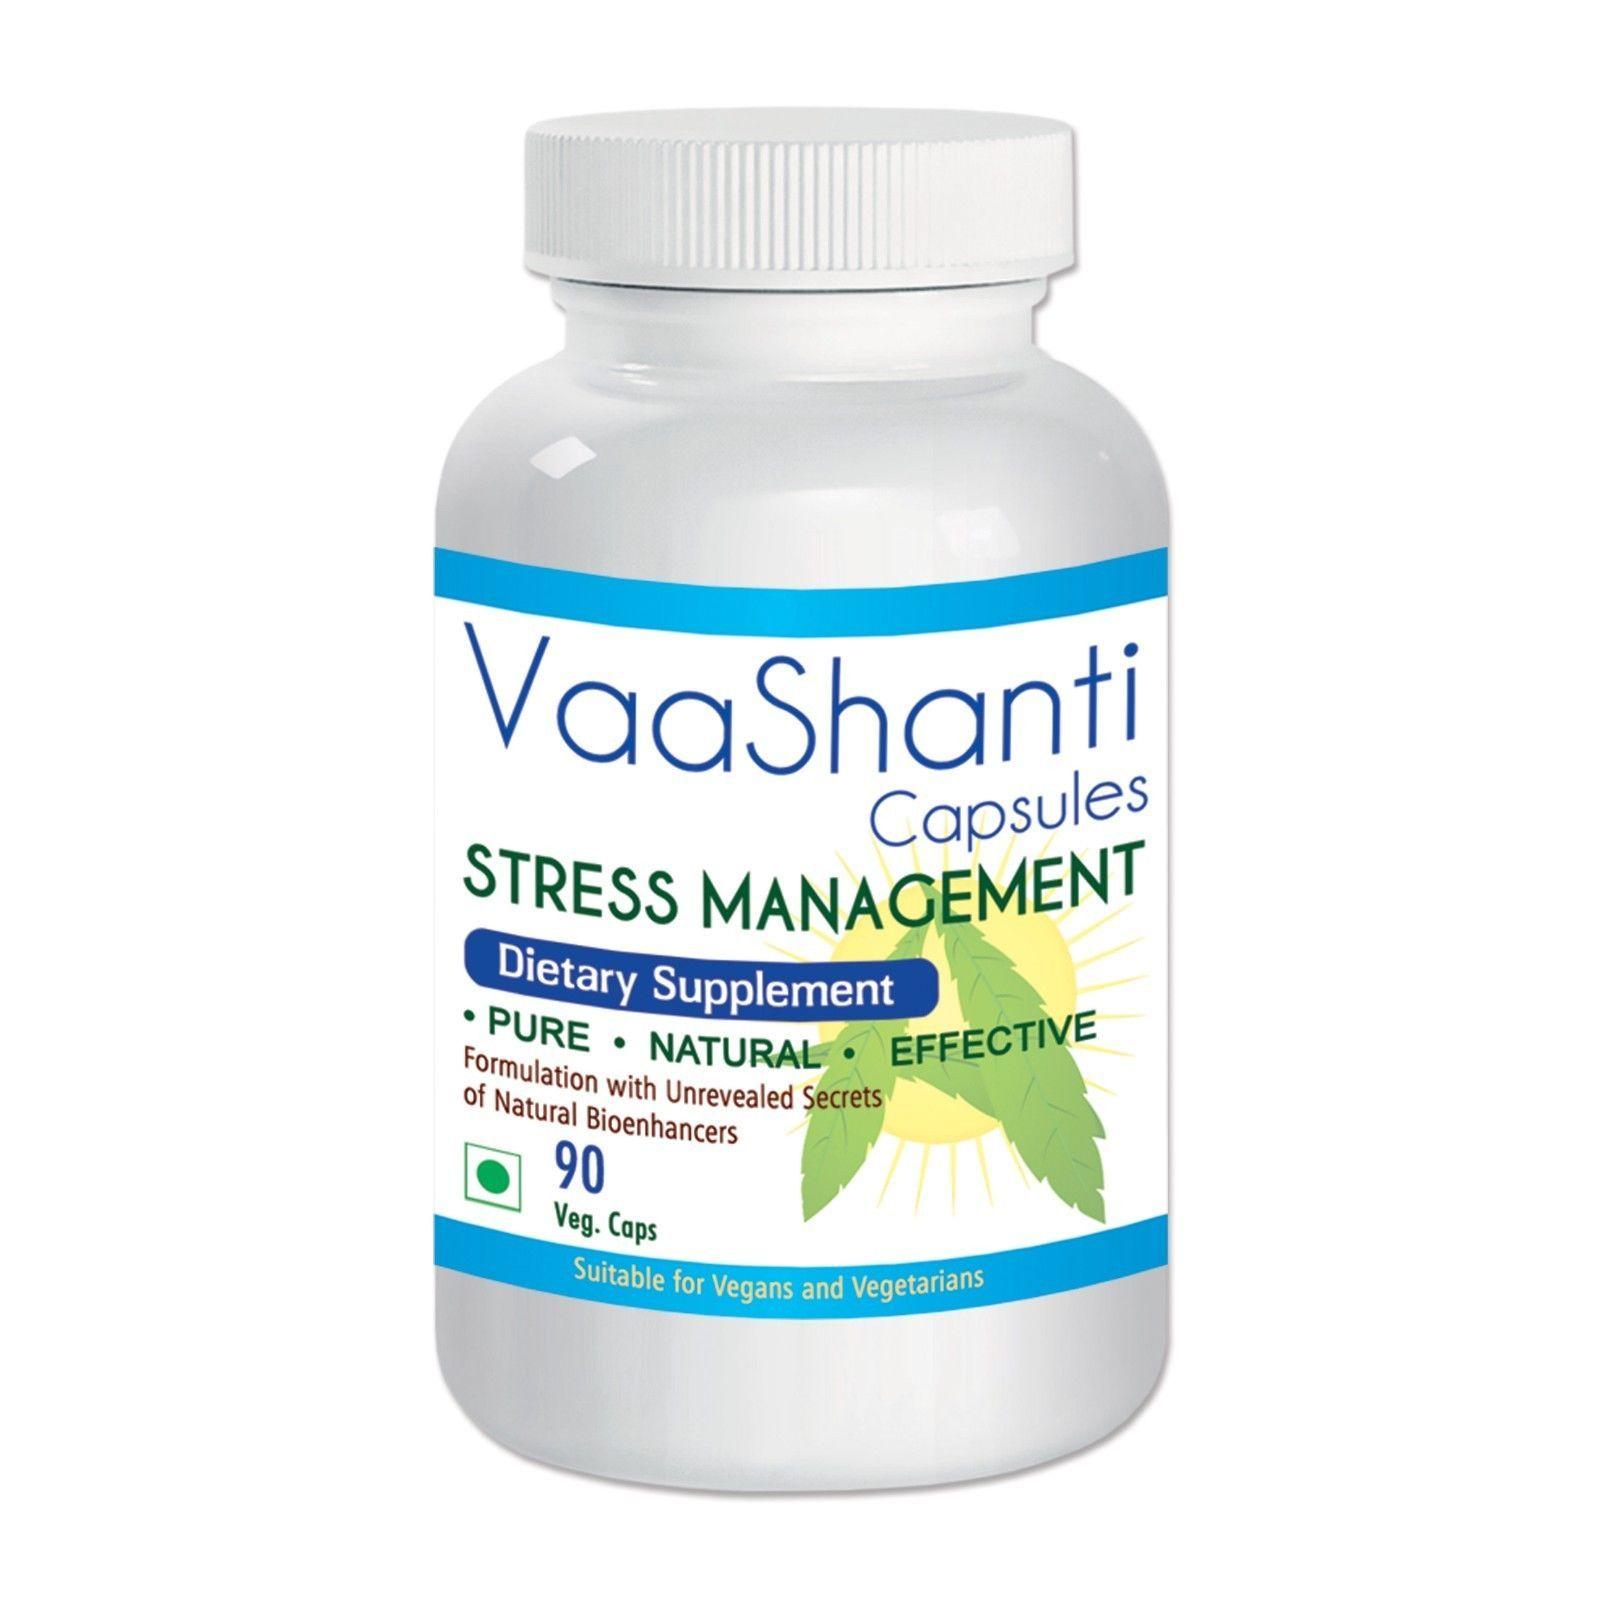 Cheap herbal supplement - Sleeping Pills Vaashanti Capsules Sleep Aid Herbal Supplement Buy It Now Only